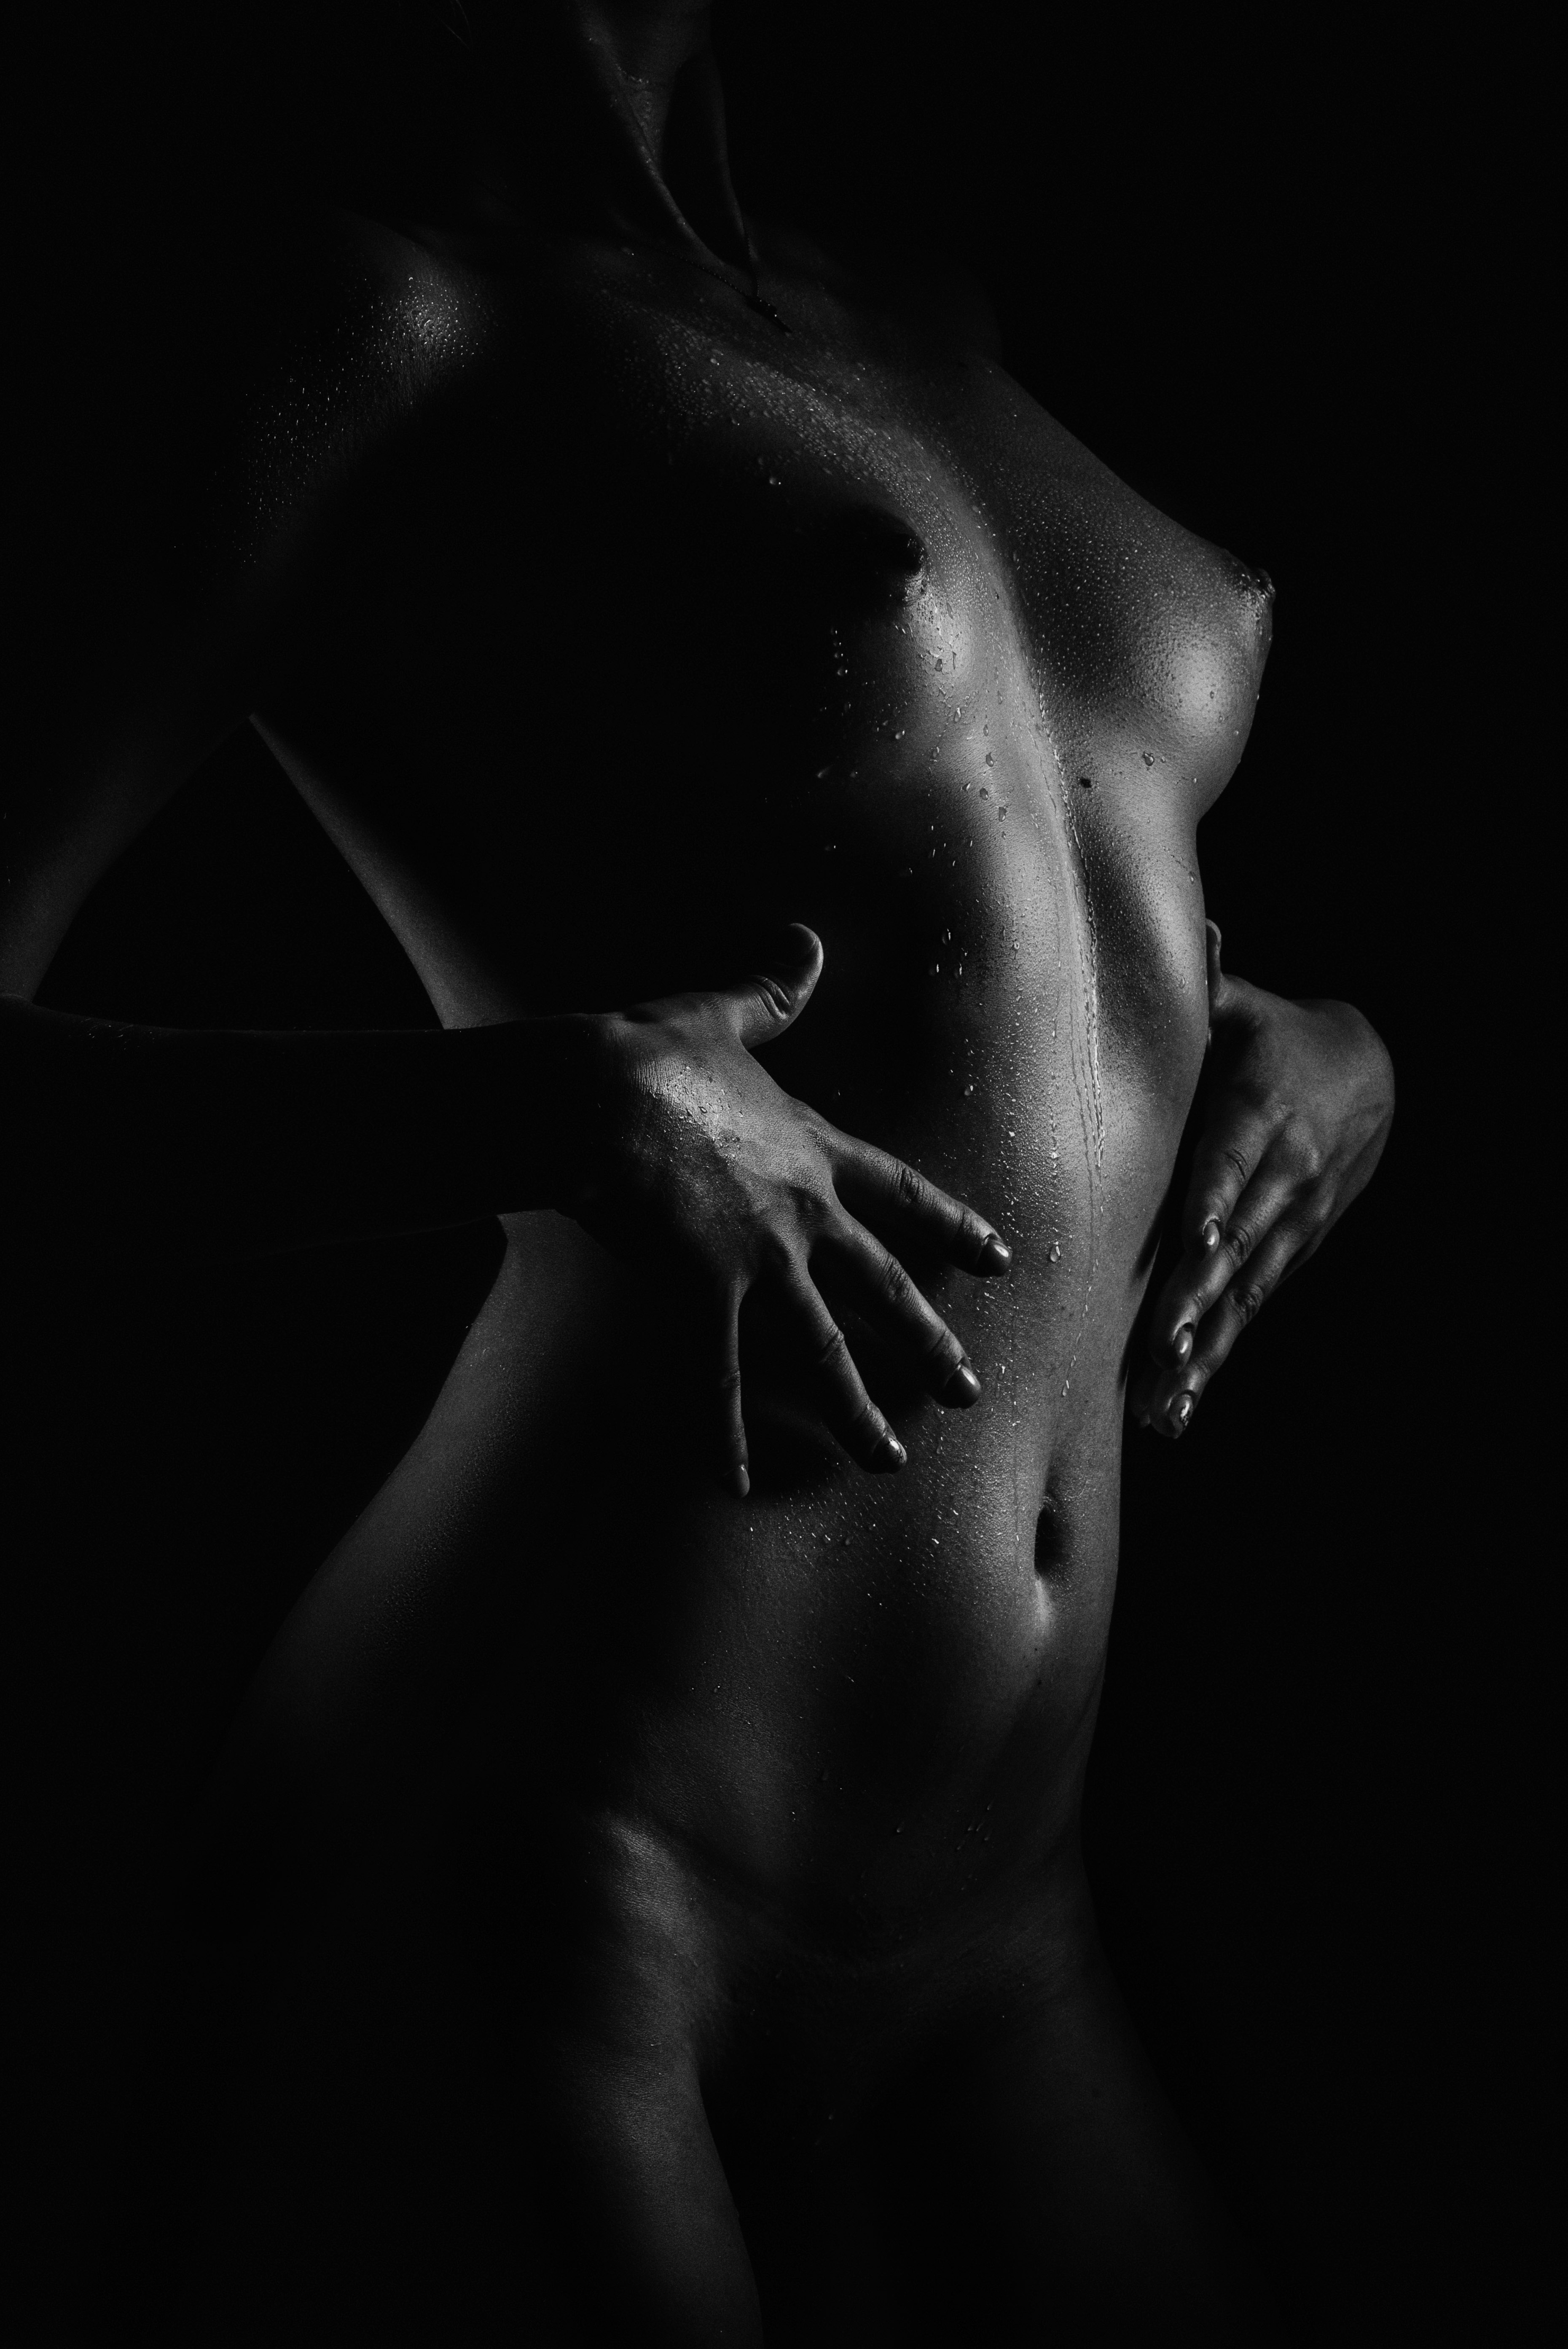 body nude woman, Кудряшов Алексей